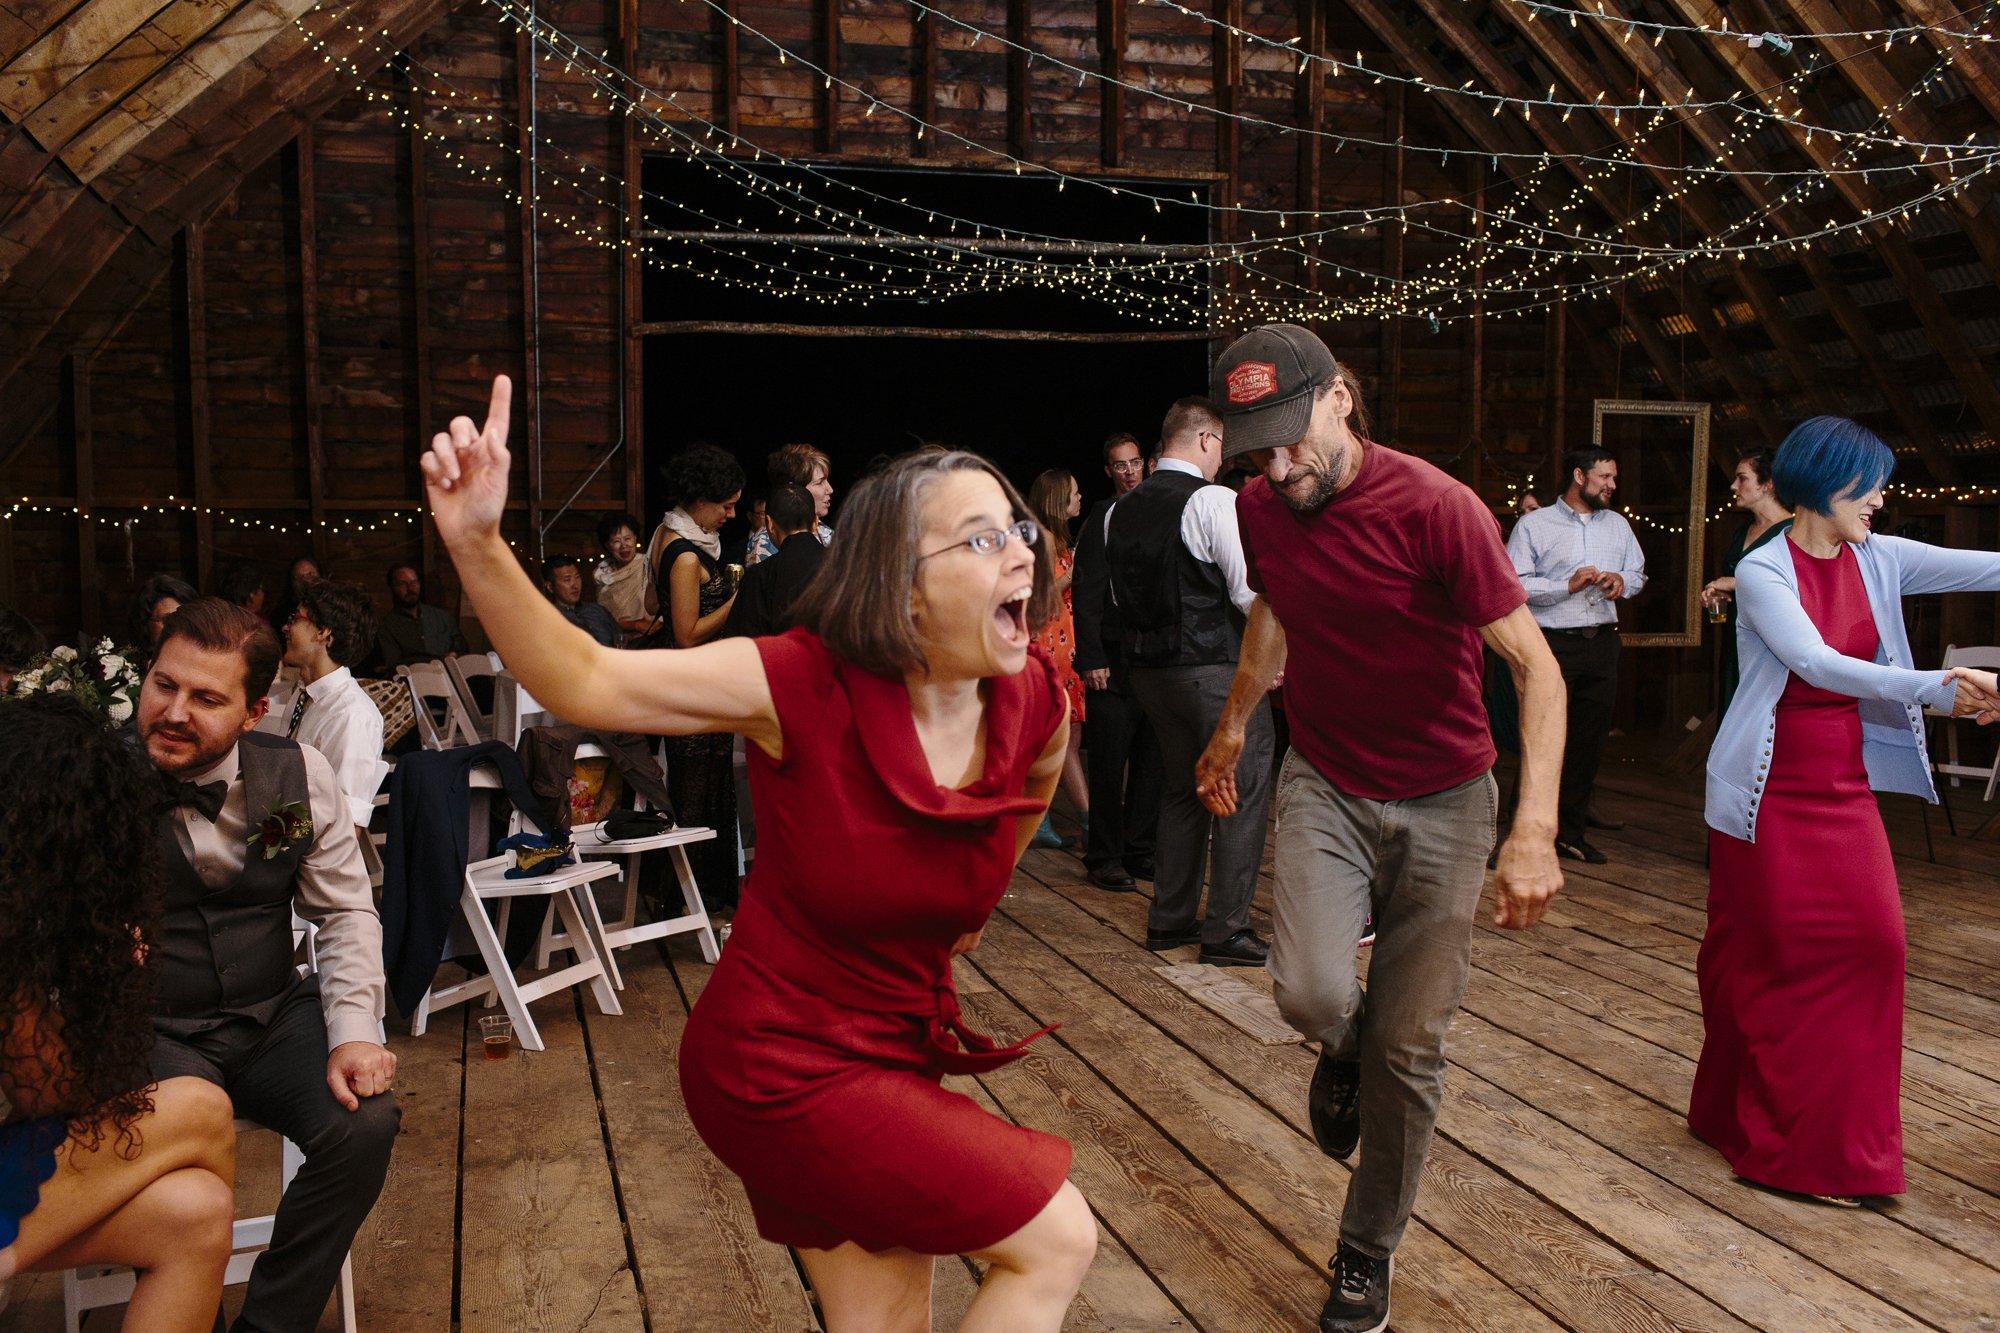 Dancing at a wedding // Methow Valley Wedding Photographer